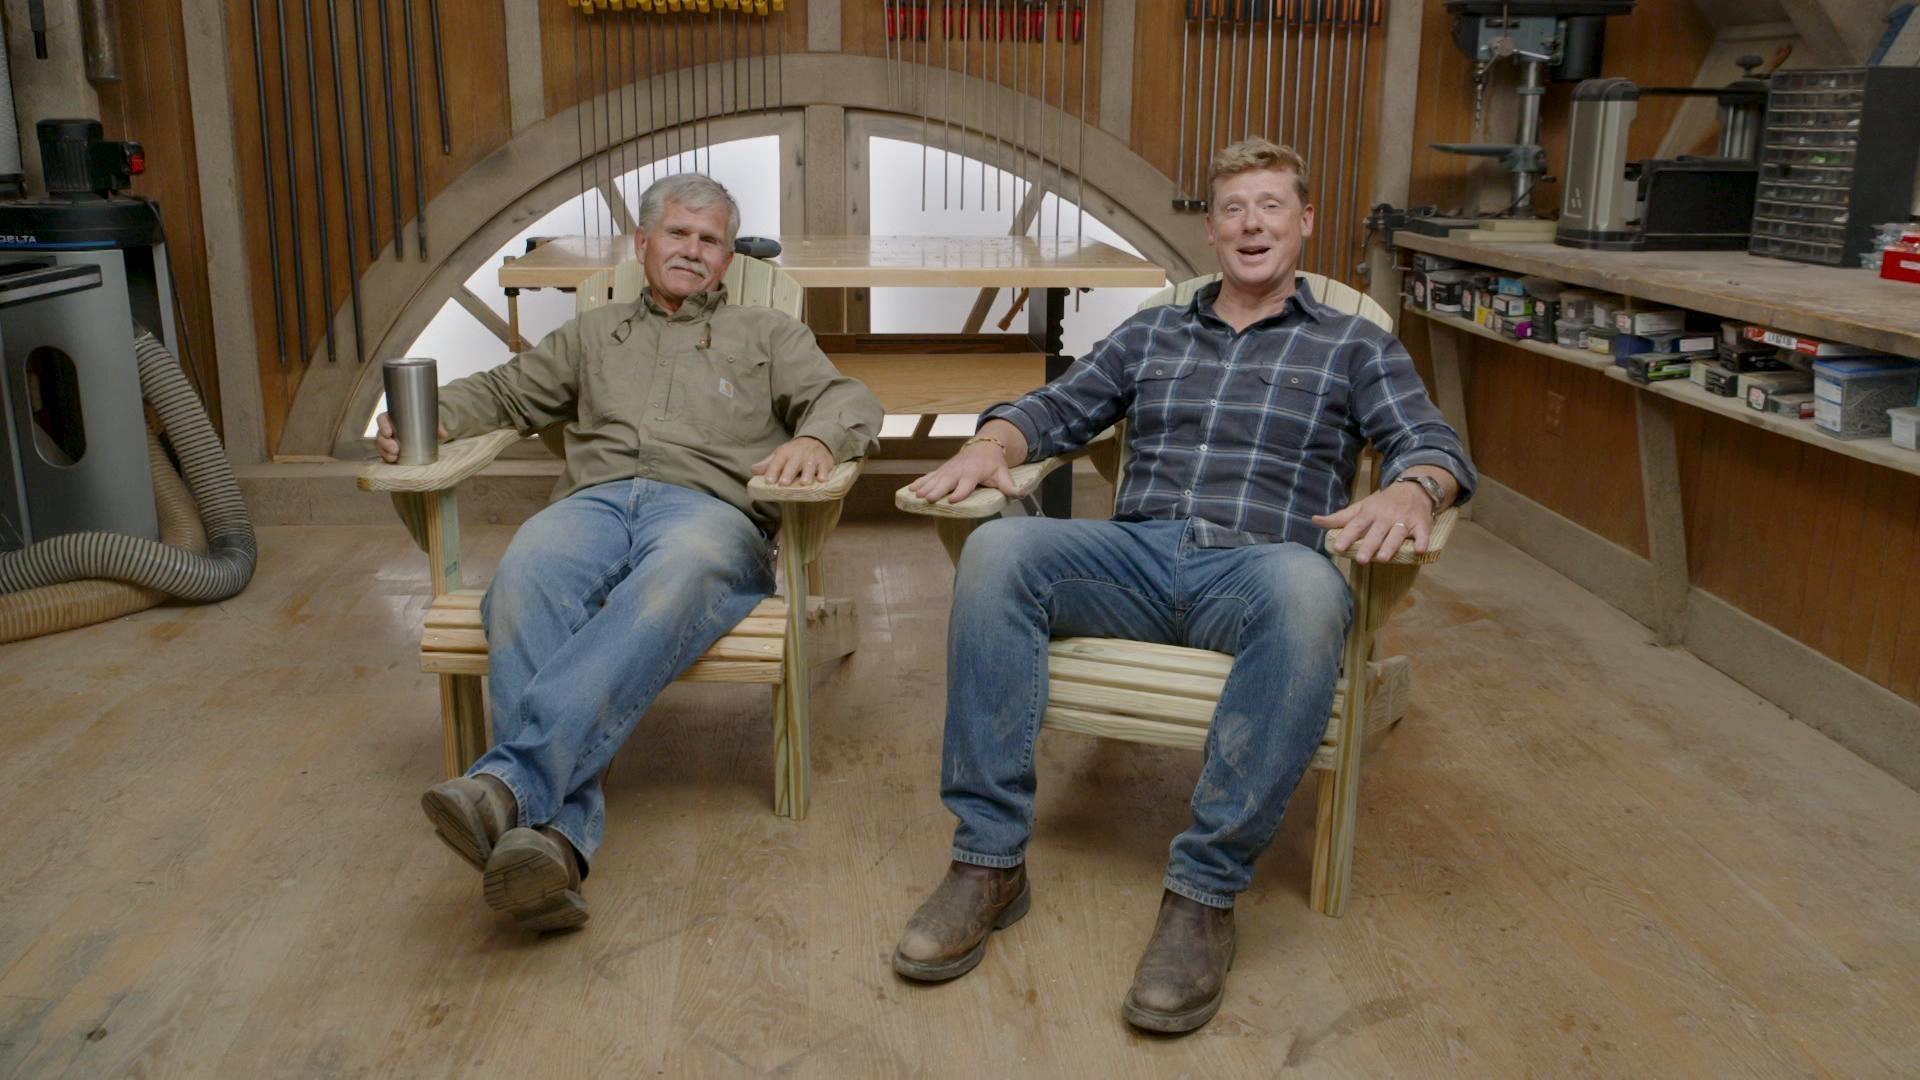 E11 | Garden Upgrade, Adirondack Chair | Ask This Old House